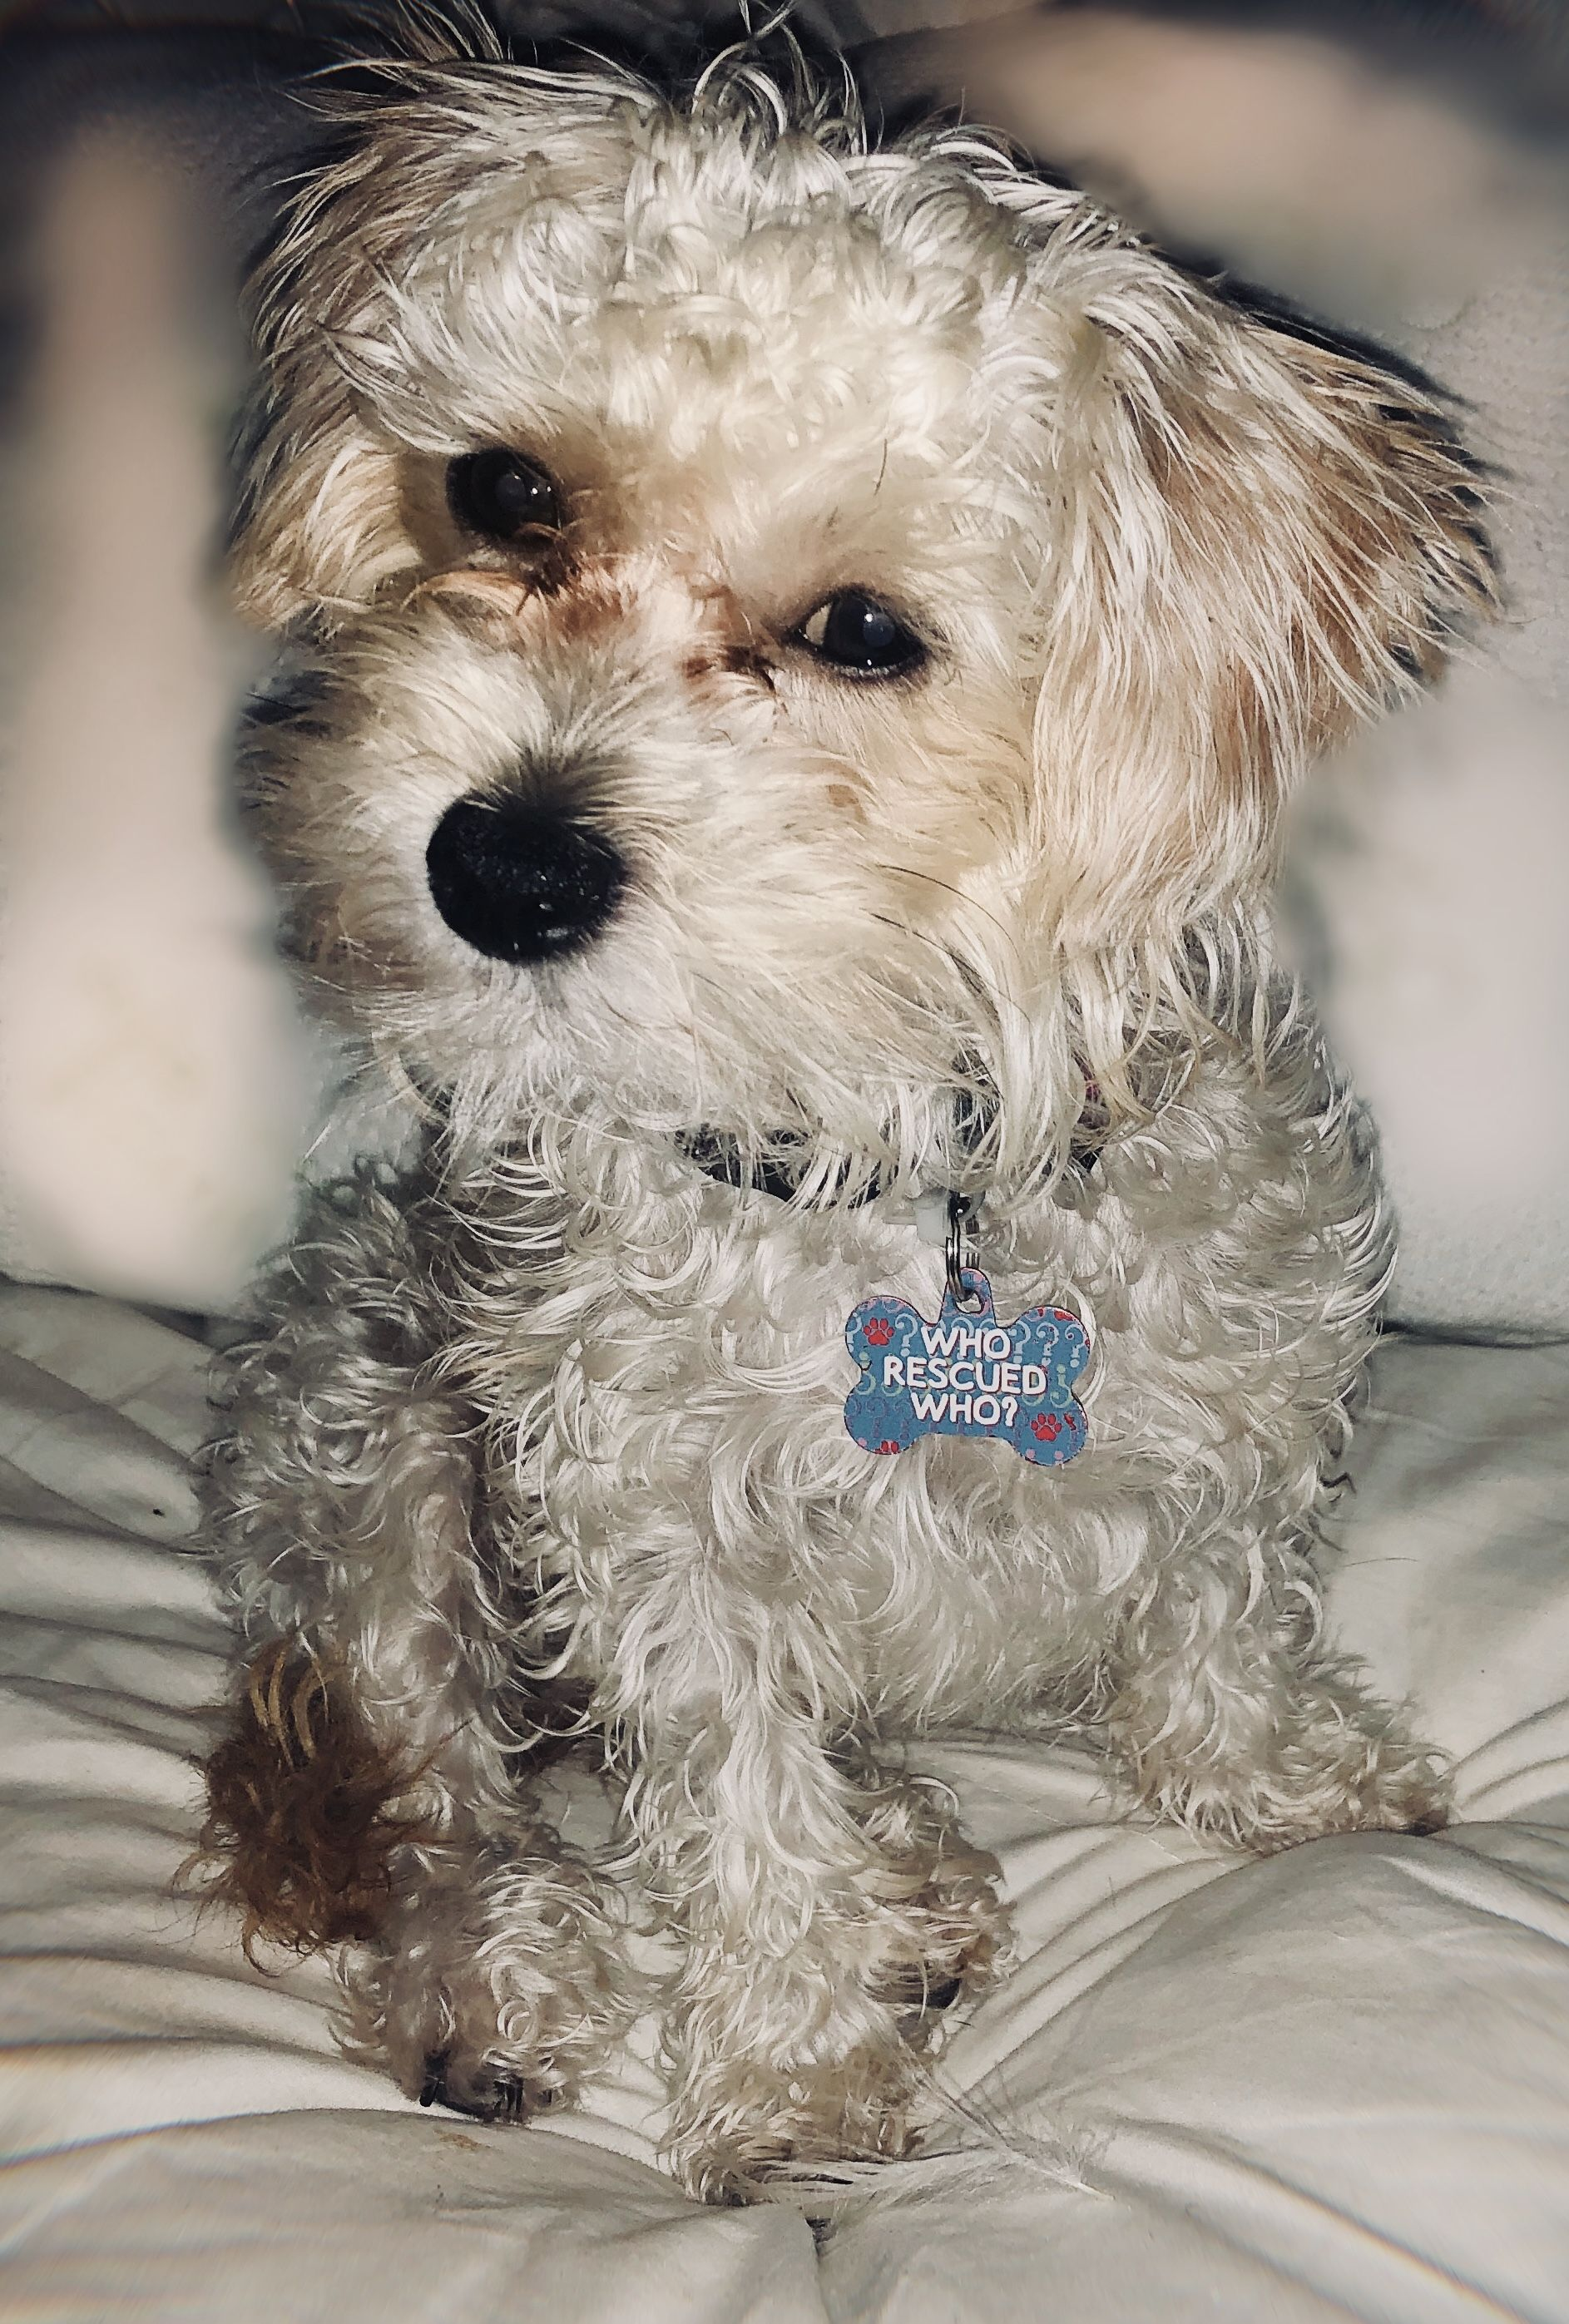 Shih Tzu Mini Poodle And Chihuahua Mix Mini Poodles Chihuahua Mix Shih Tzu